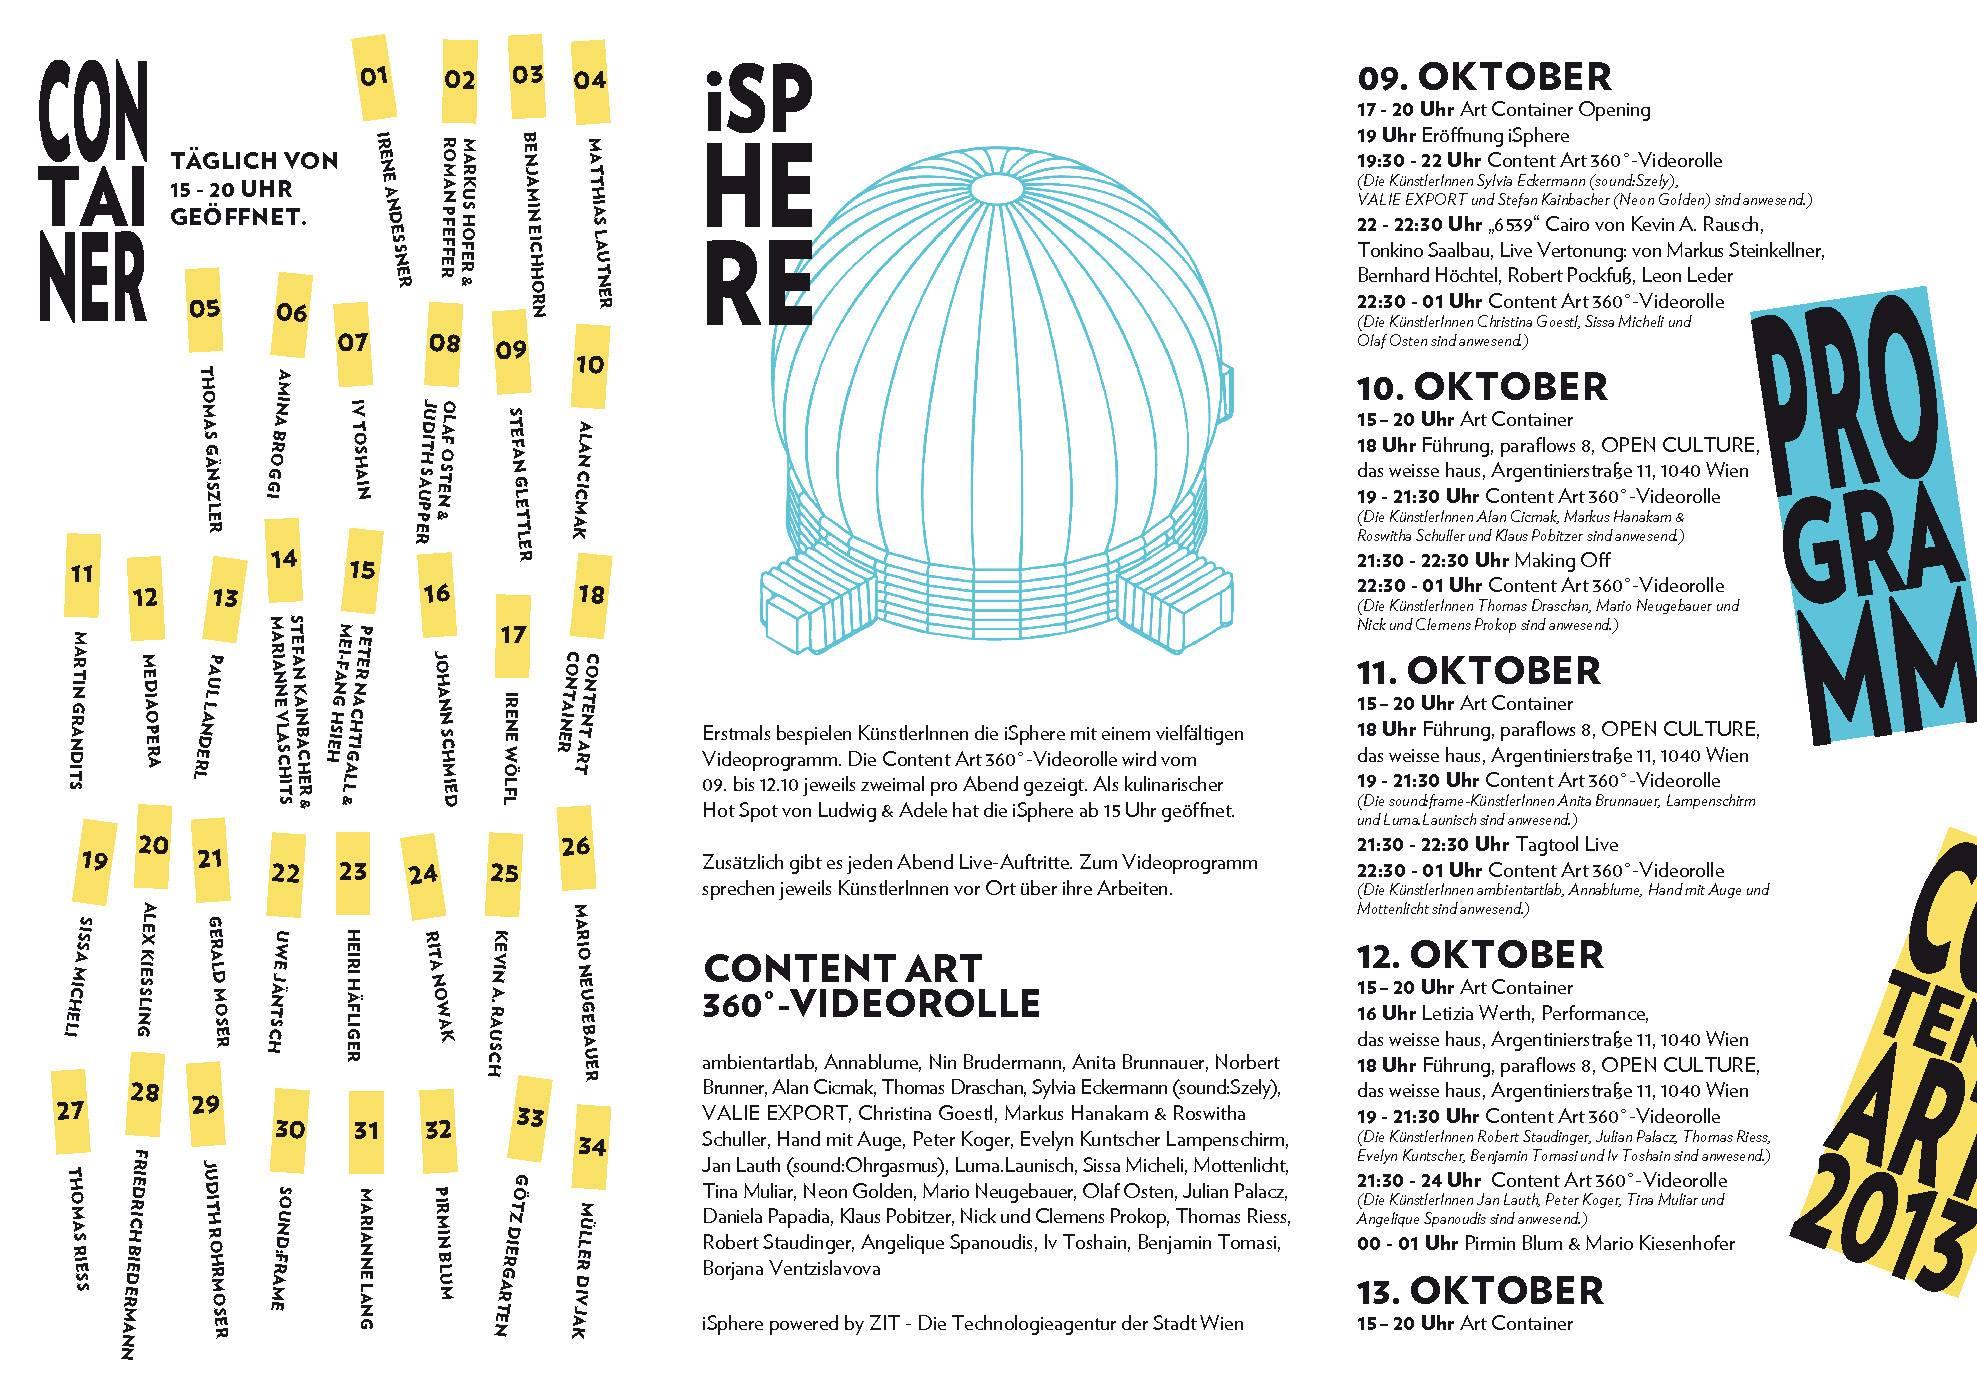 Programm Content Art 2013 Karlsplatz iSphere